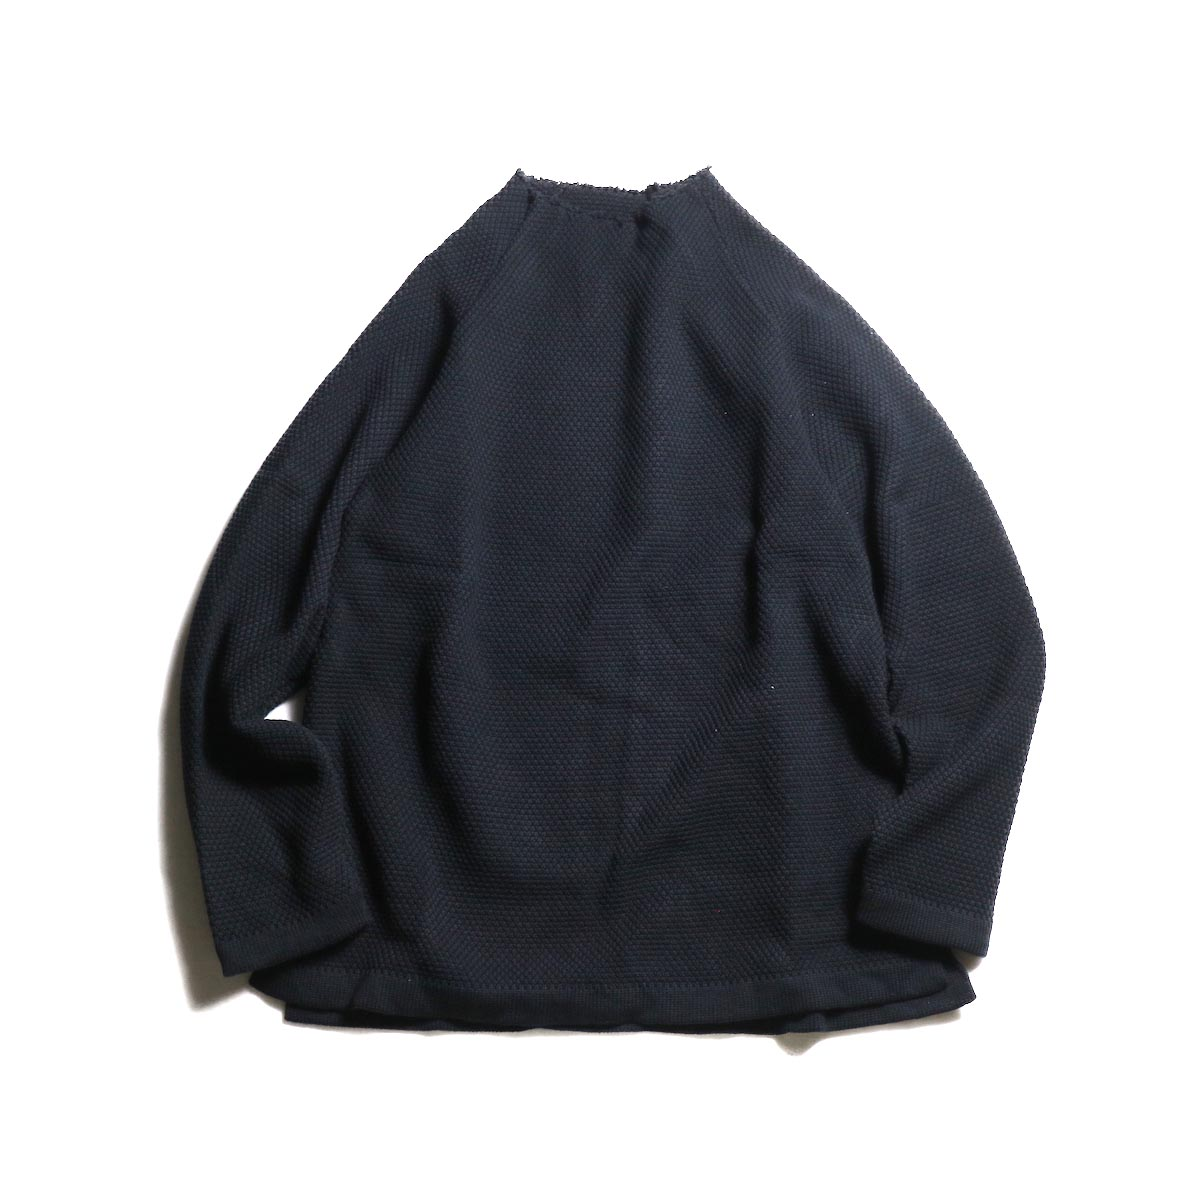 CURLY / KIPS BTL SWEATER (Black)